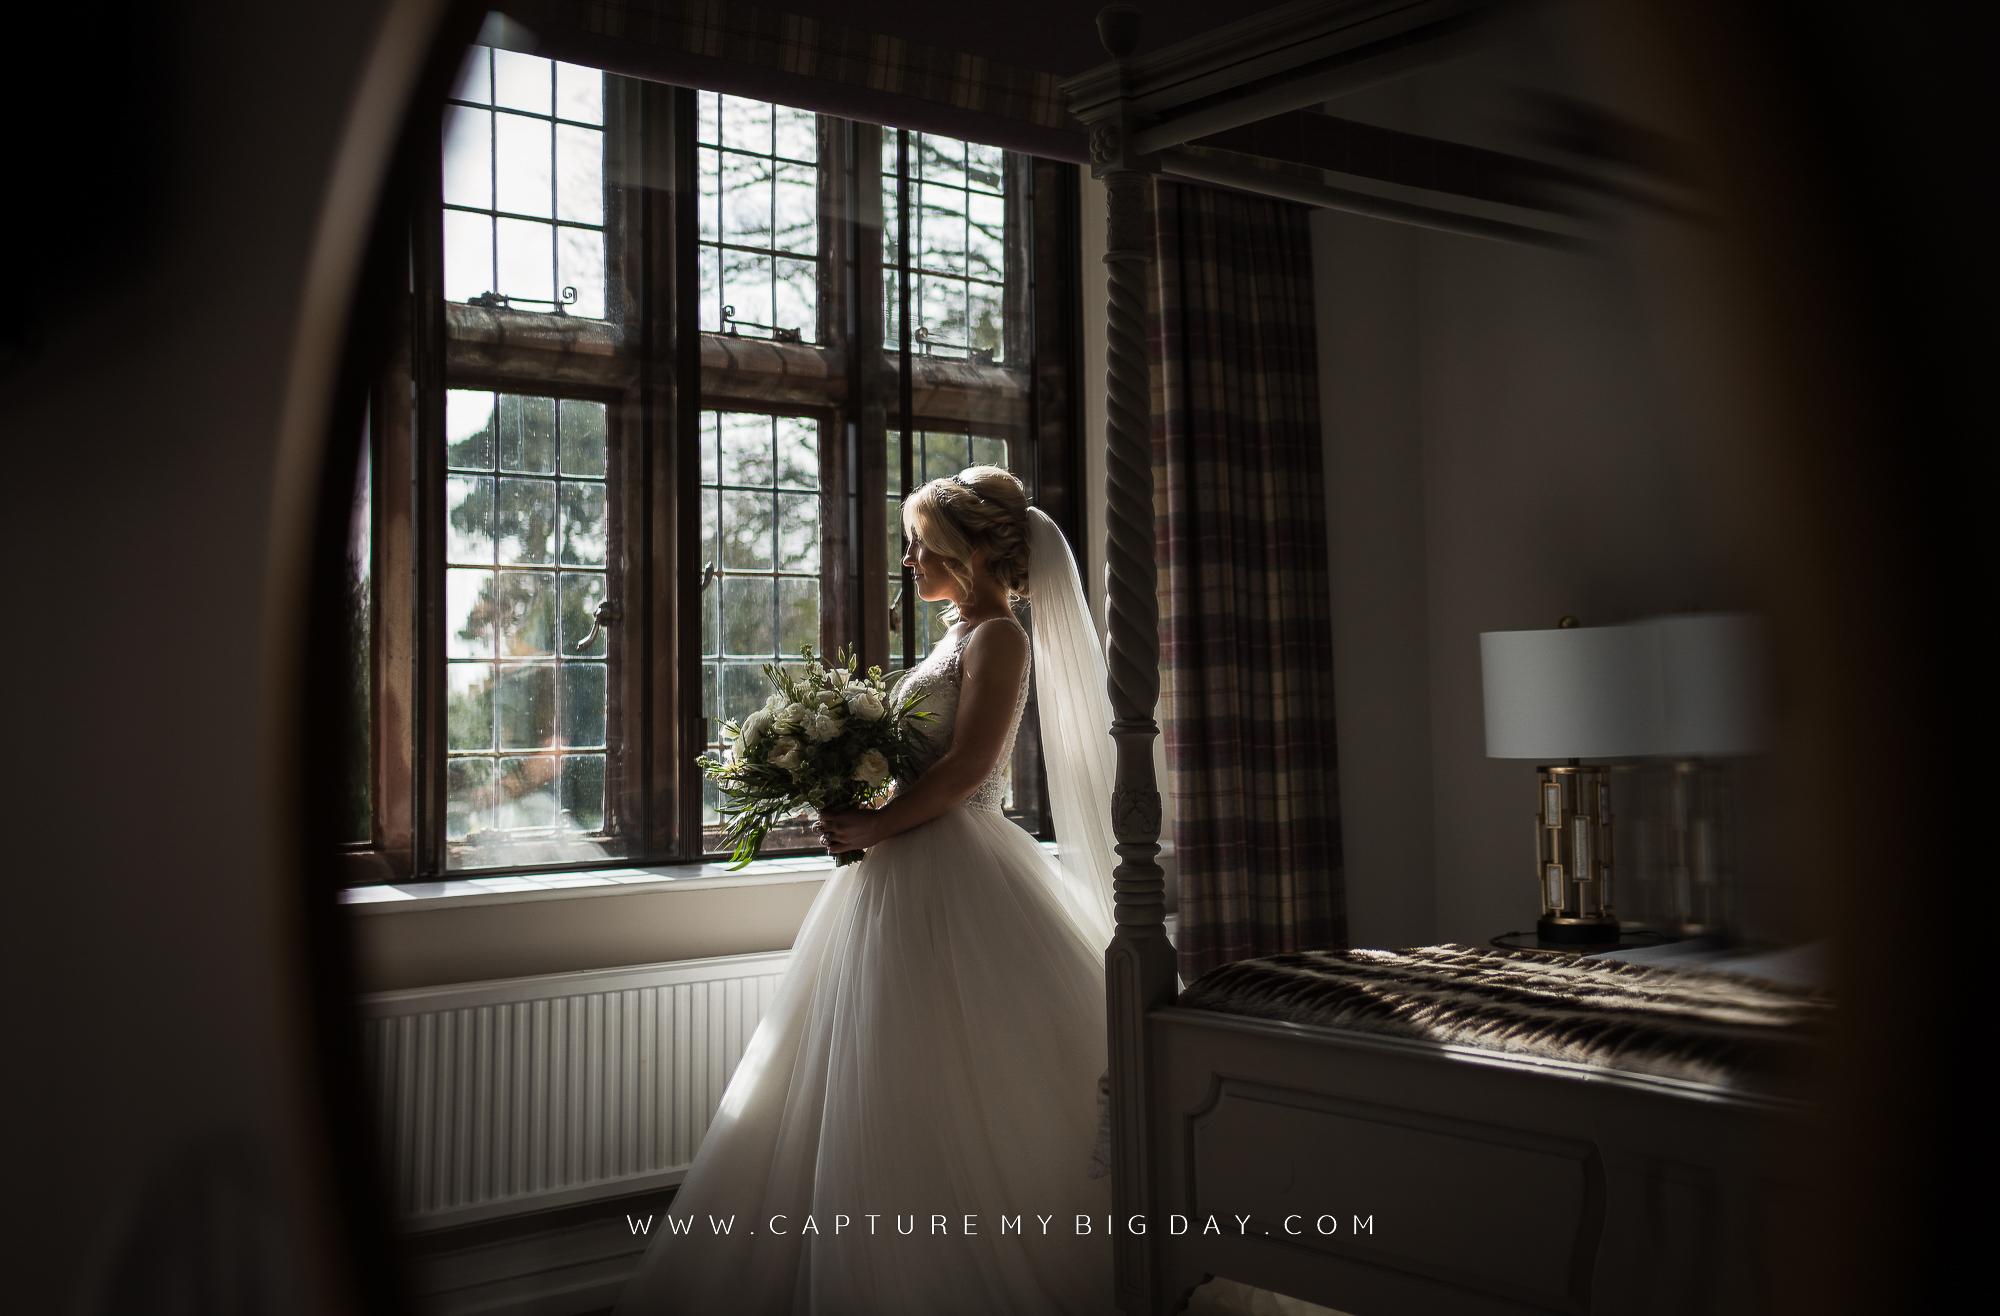 bride looking out of window wearing her wedding dress